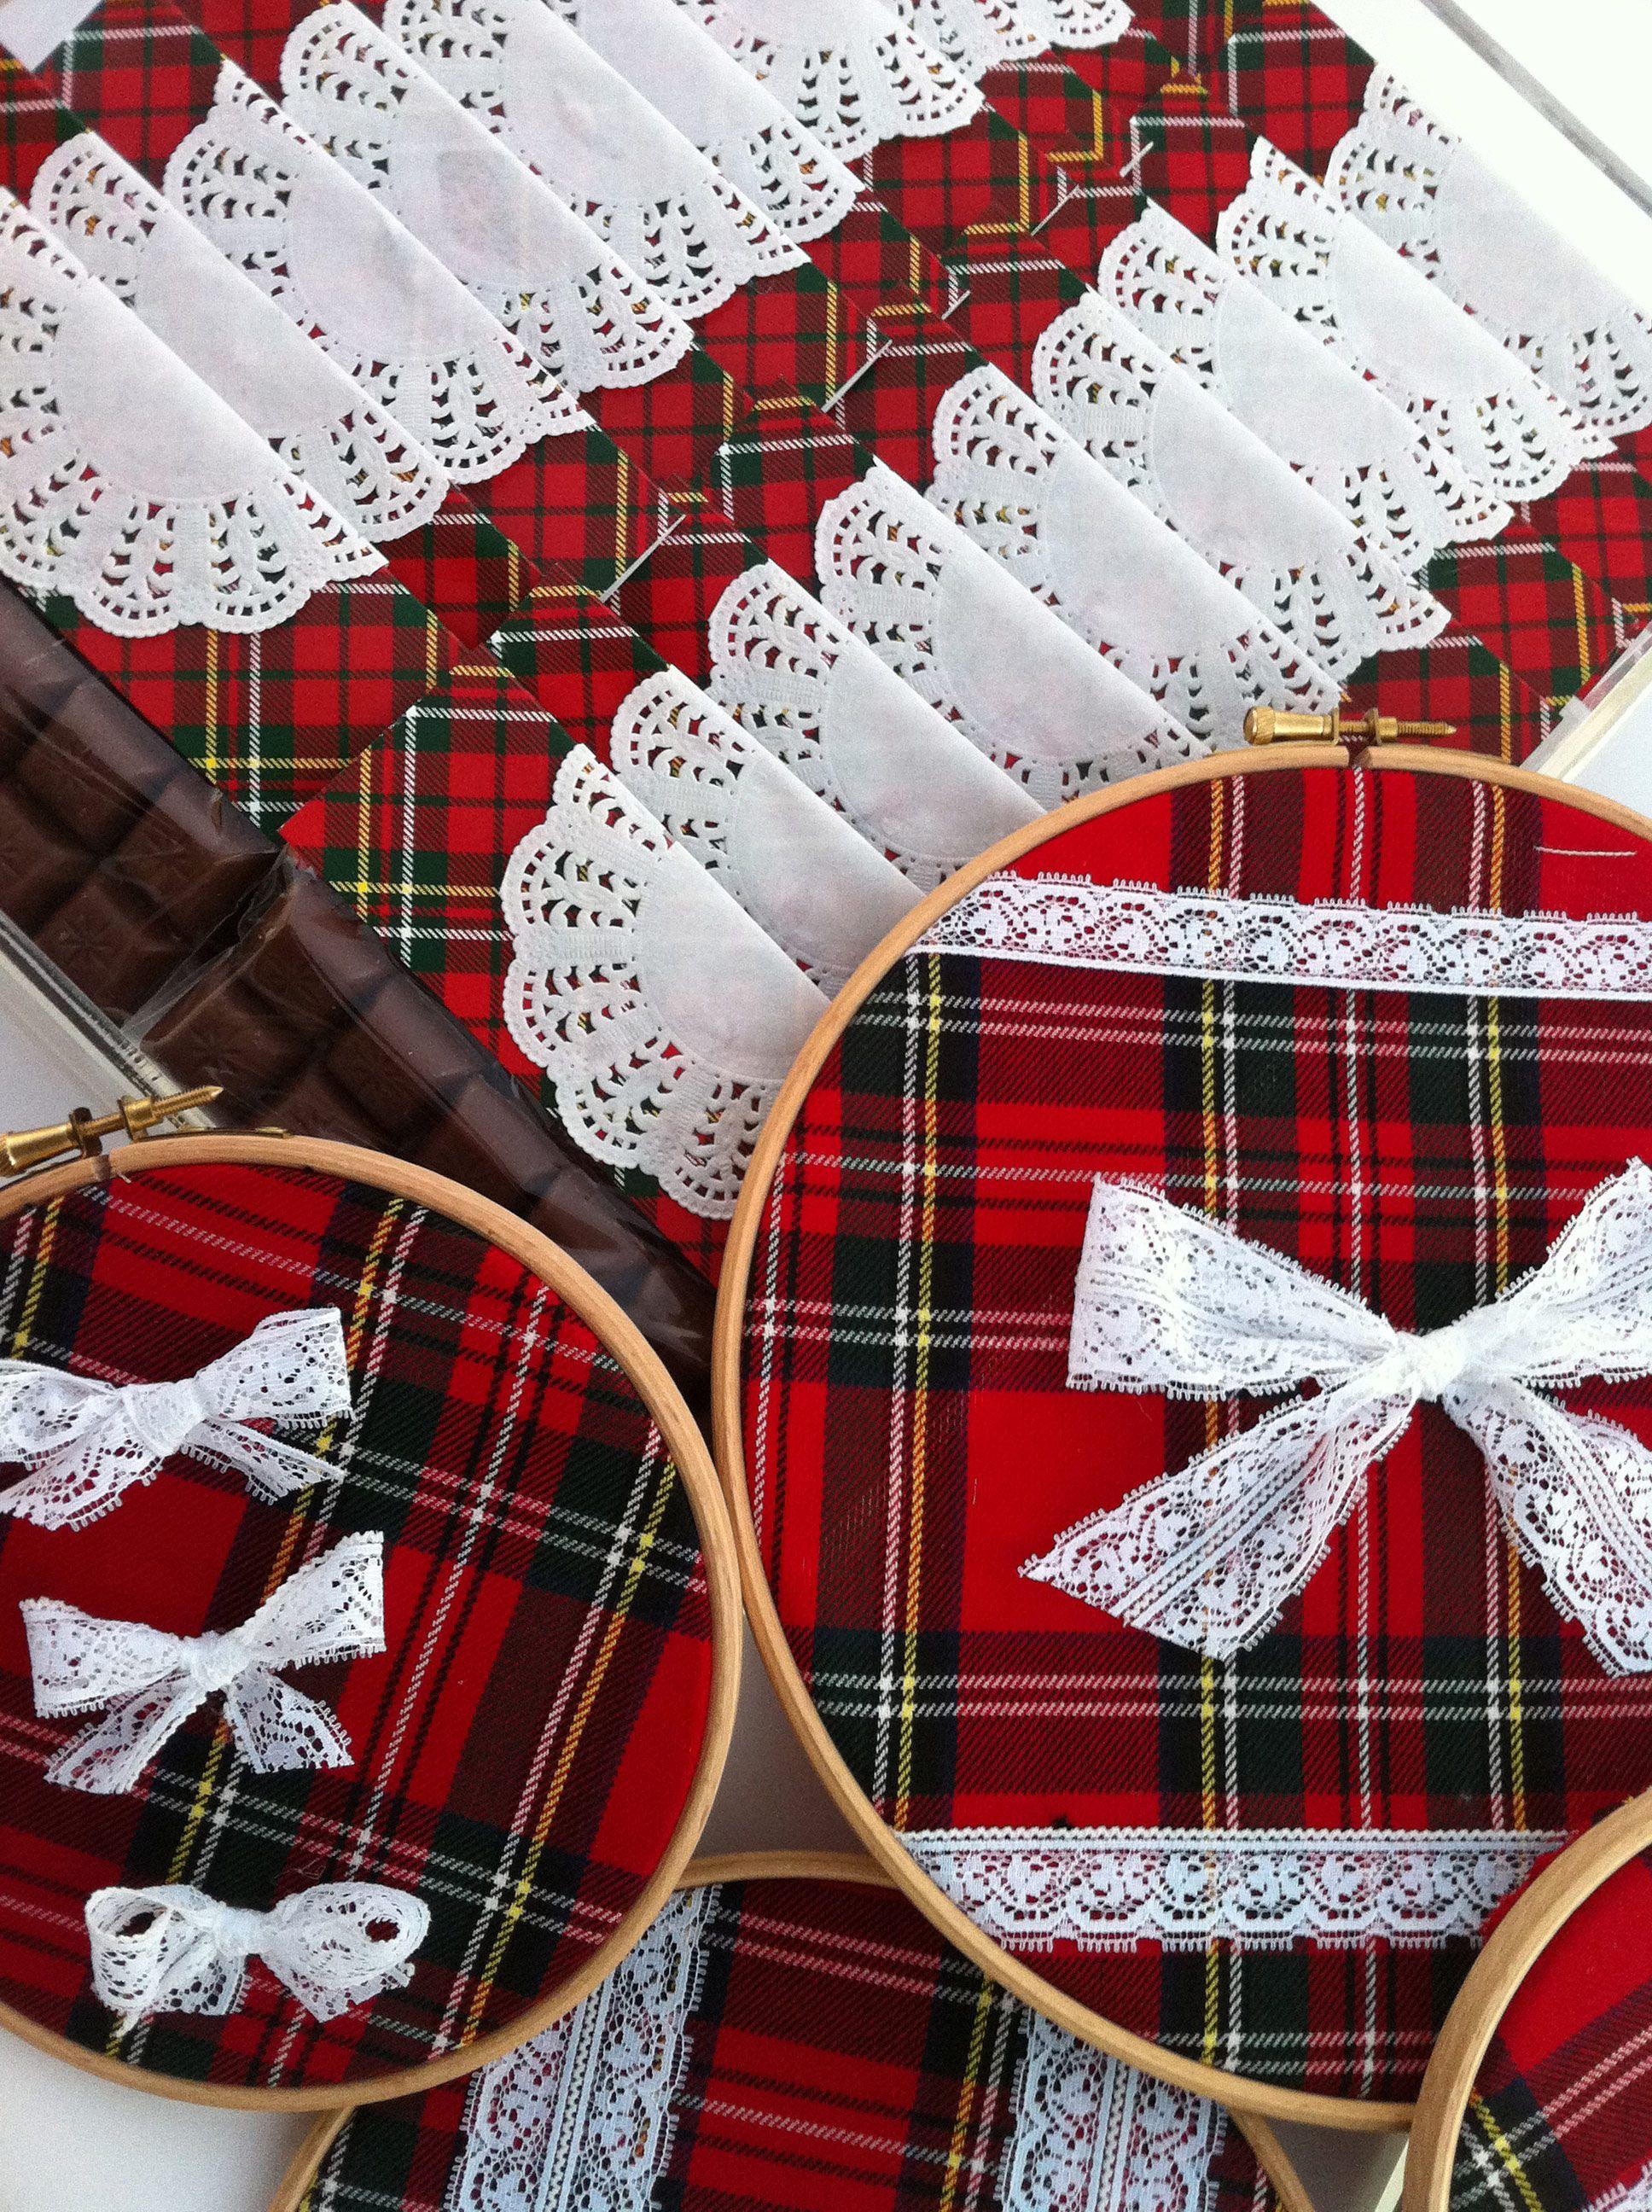 Tartan Lace Tartan Pattern Scottish Tartans Tartan